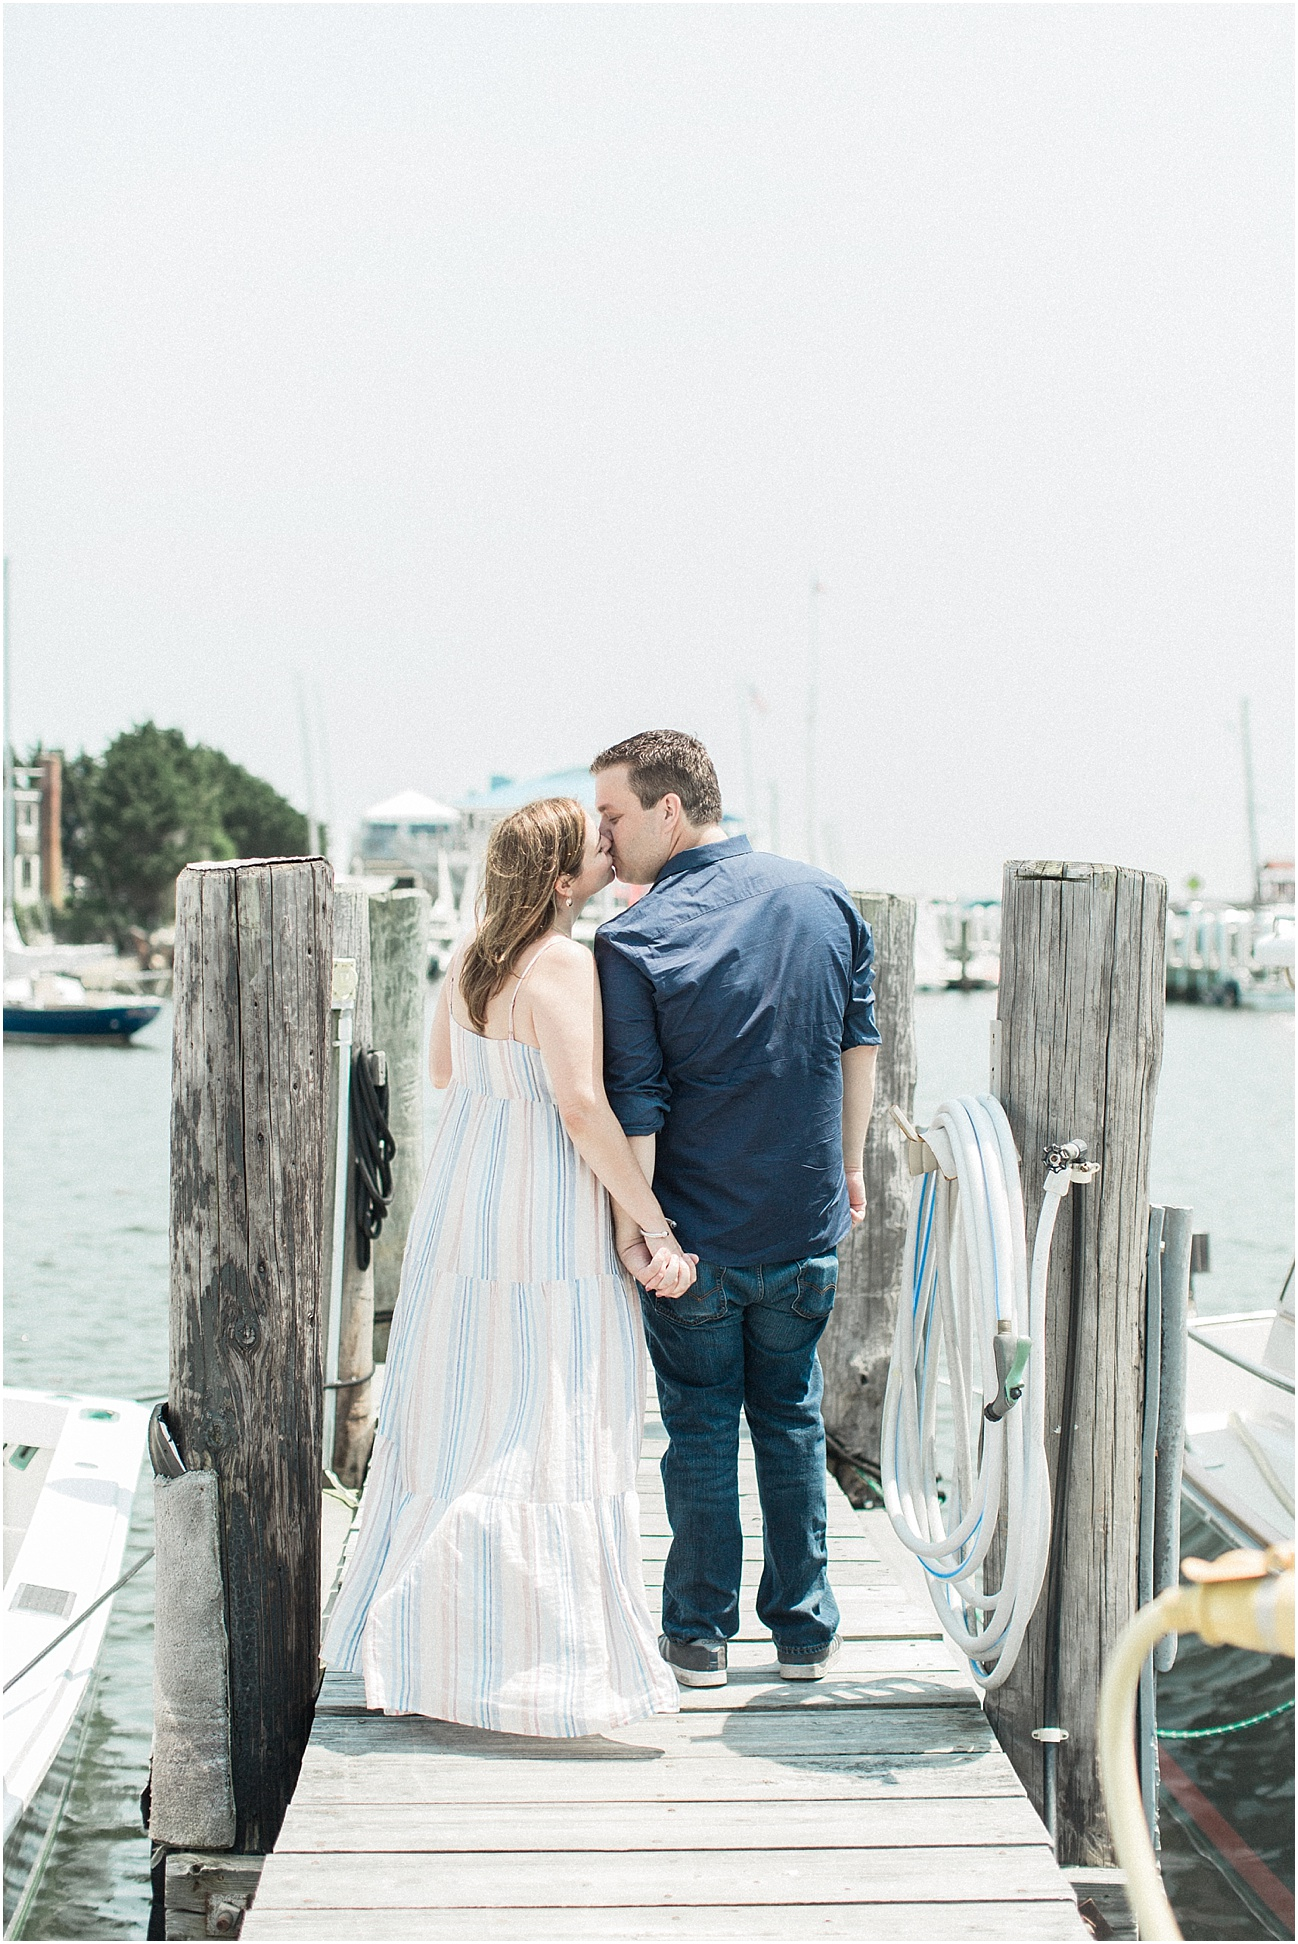 kati_bryan_maskell_white_cliffs_country_club_cape_cod_boston_wedding_photographer_meredith_jane_photography_photo_0517.jpg